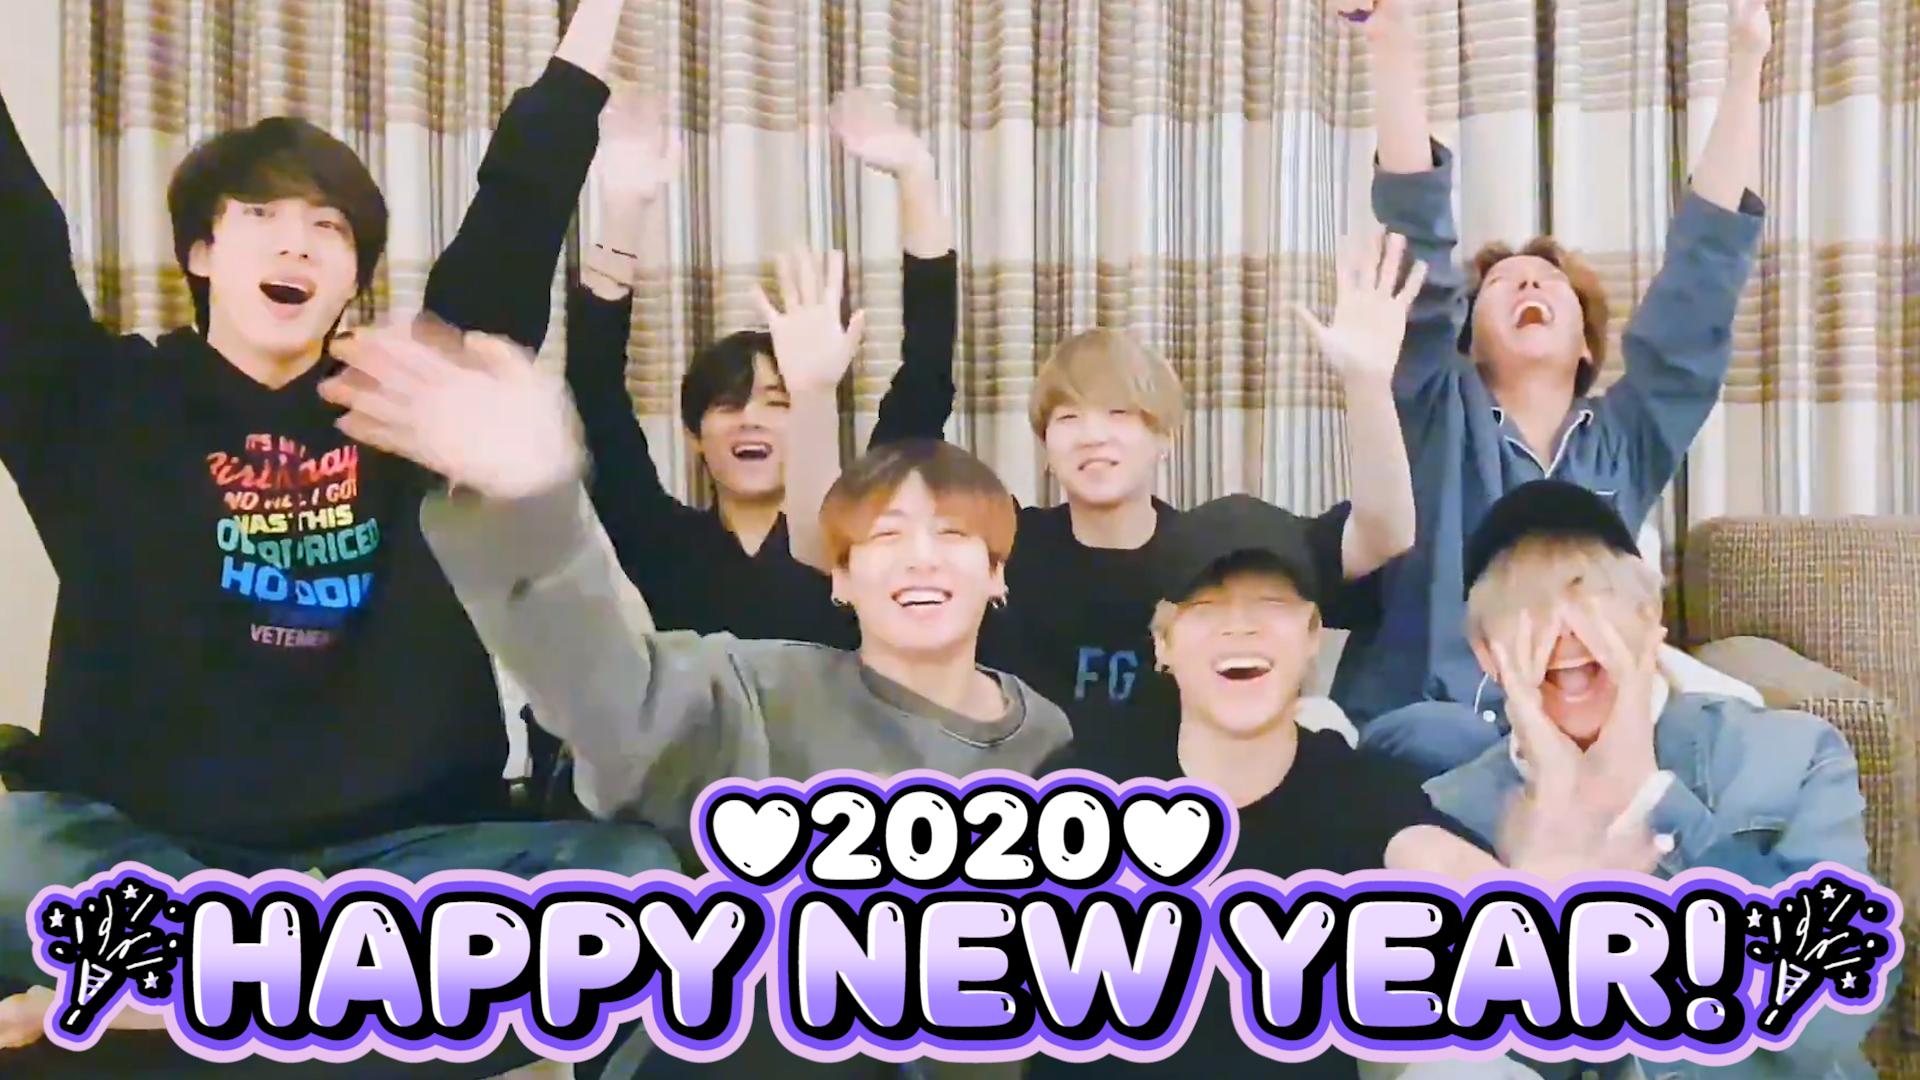 [BTS] 2020 덕담 트렌드는 인과응보 스타일, 복 받으려면 잘하자~!💜ヽ(・∀・)ノ💜 (BTS's New Year Countdown)